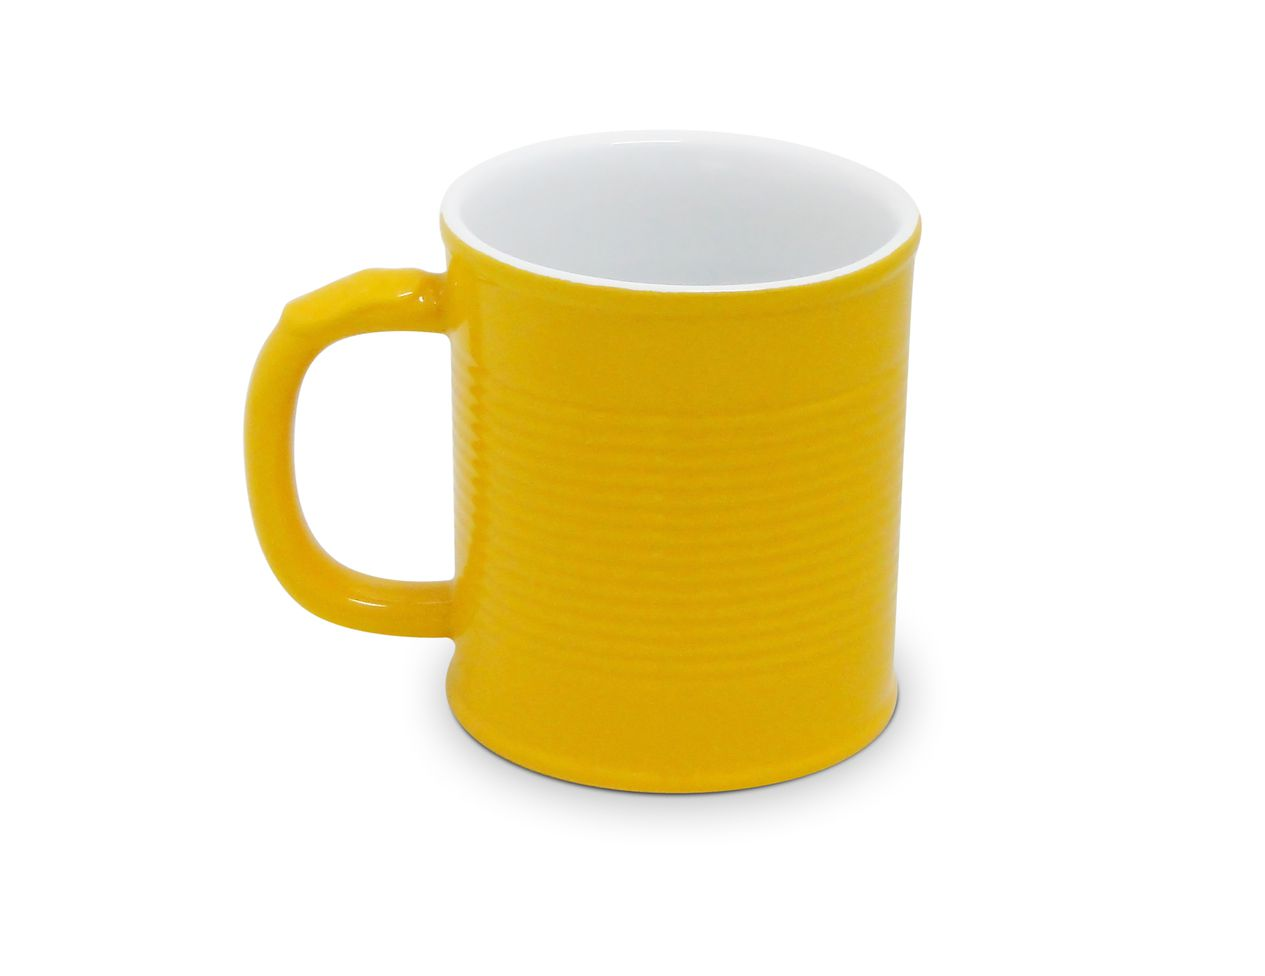 Caneca Lata 350Ml - Amarelo